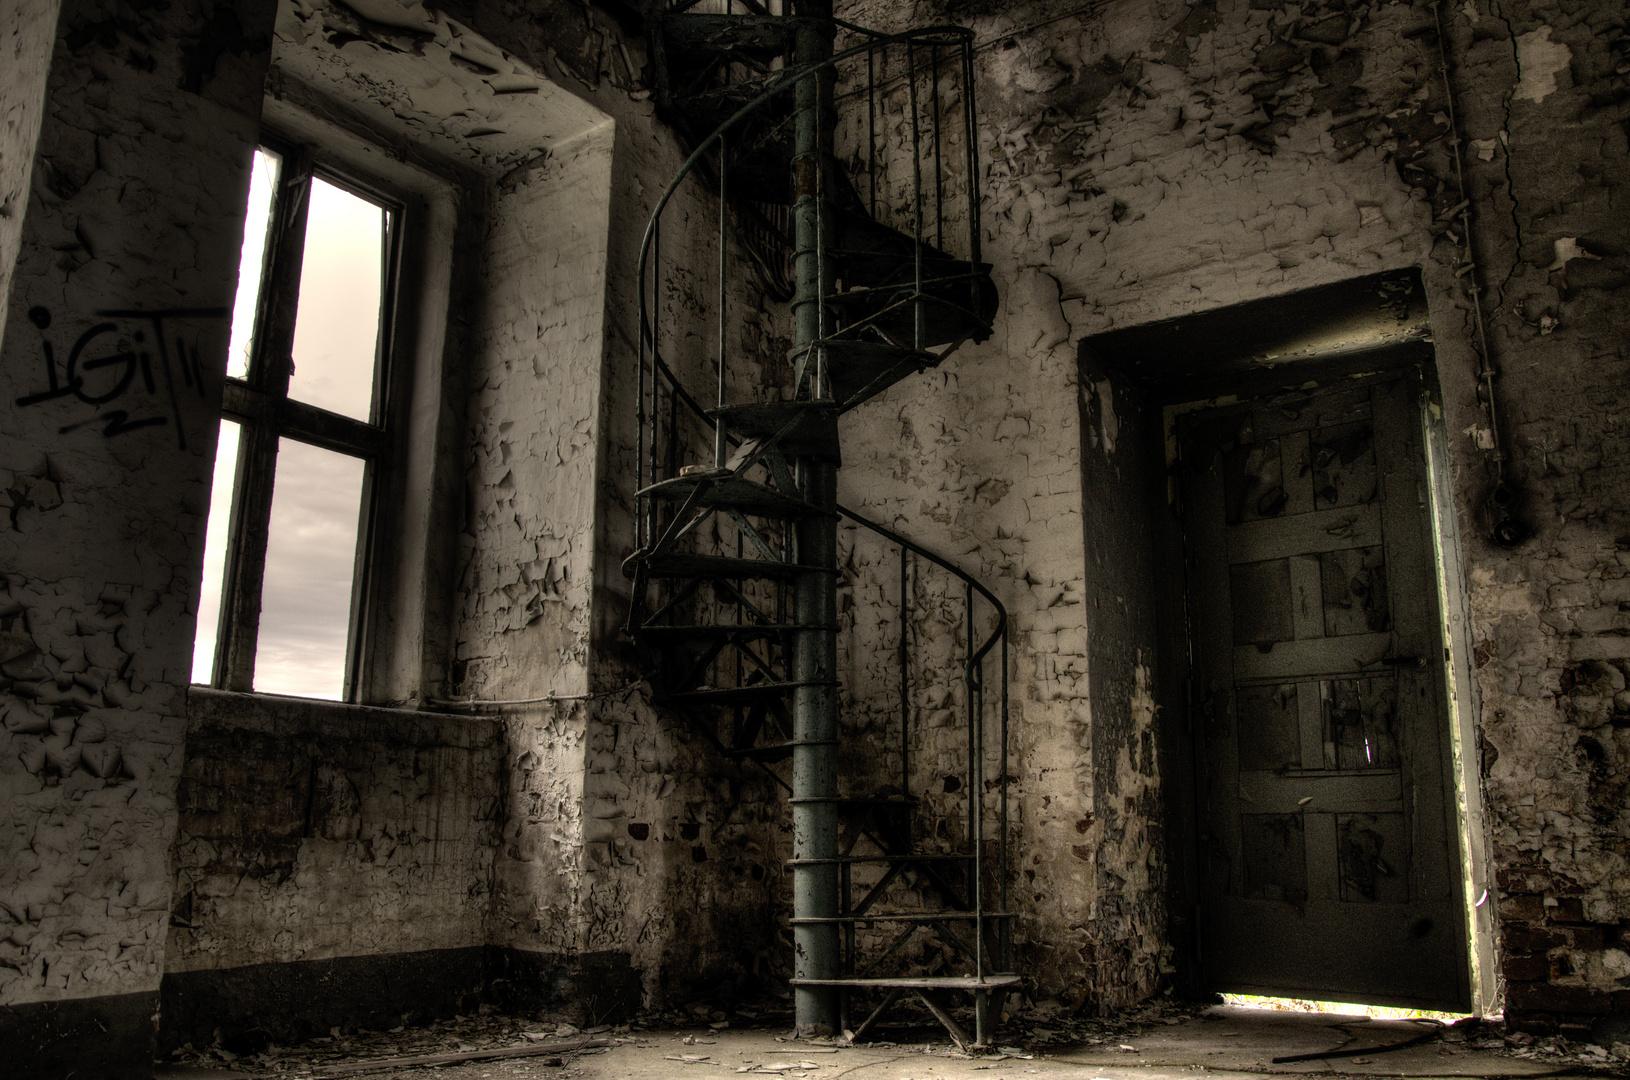 alte Wendeltreppe... old spiral staircase